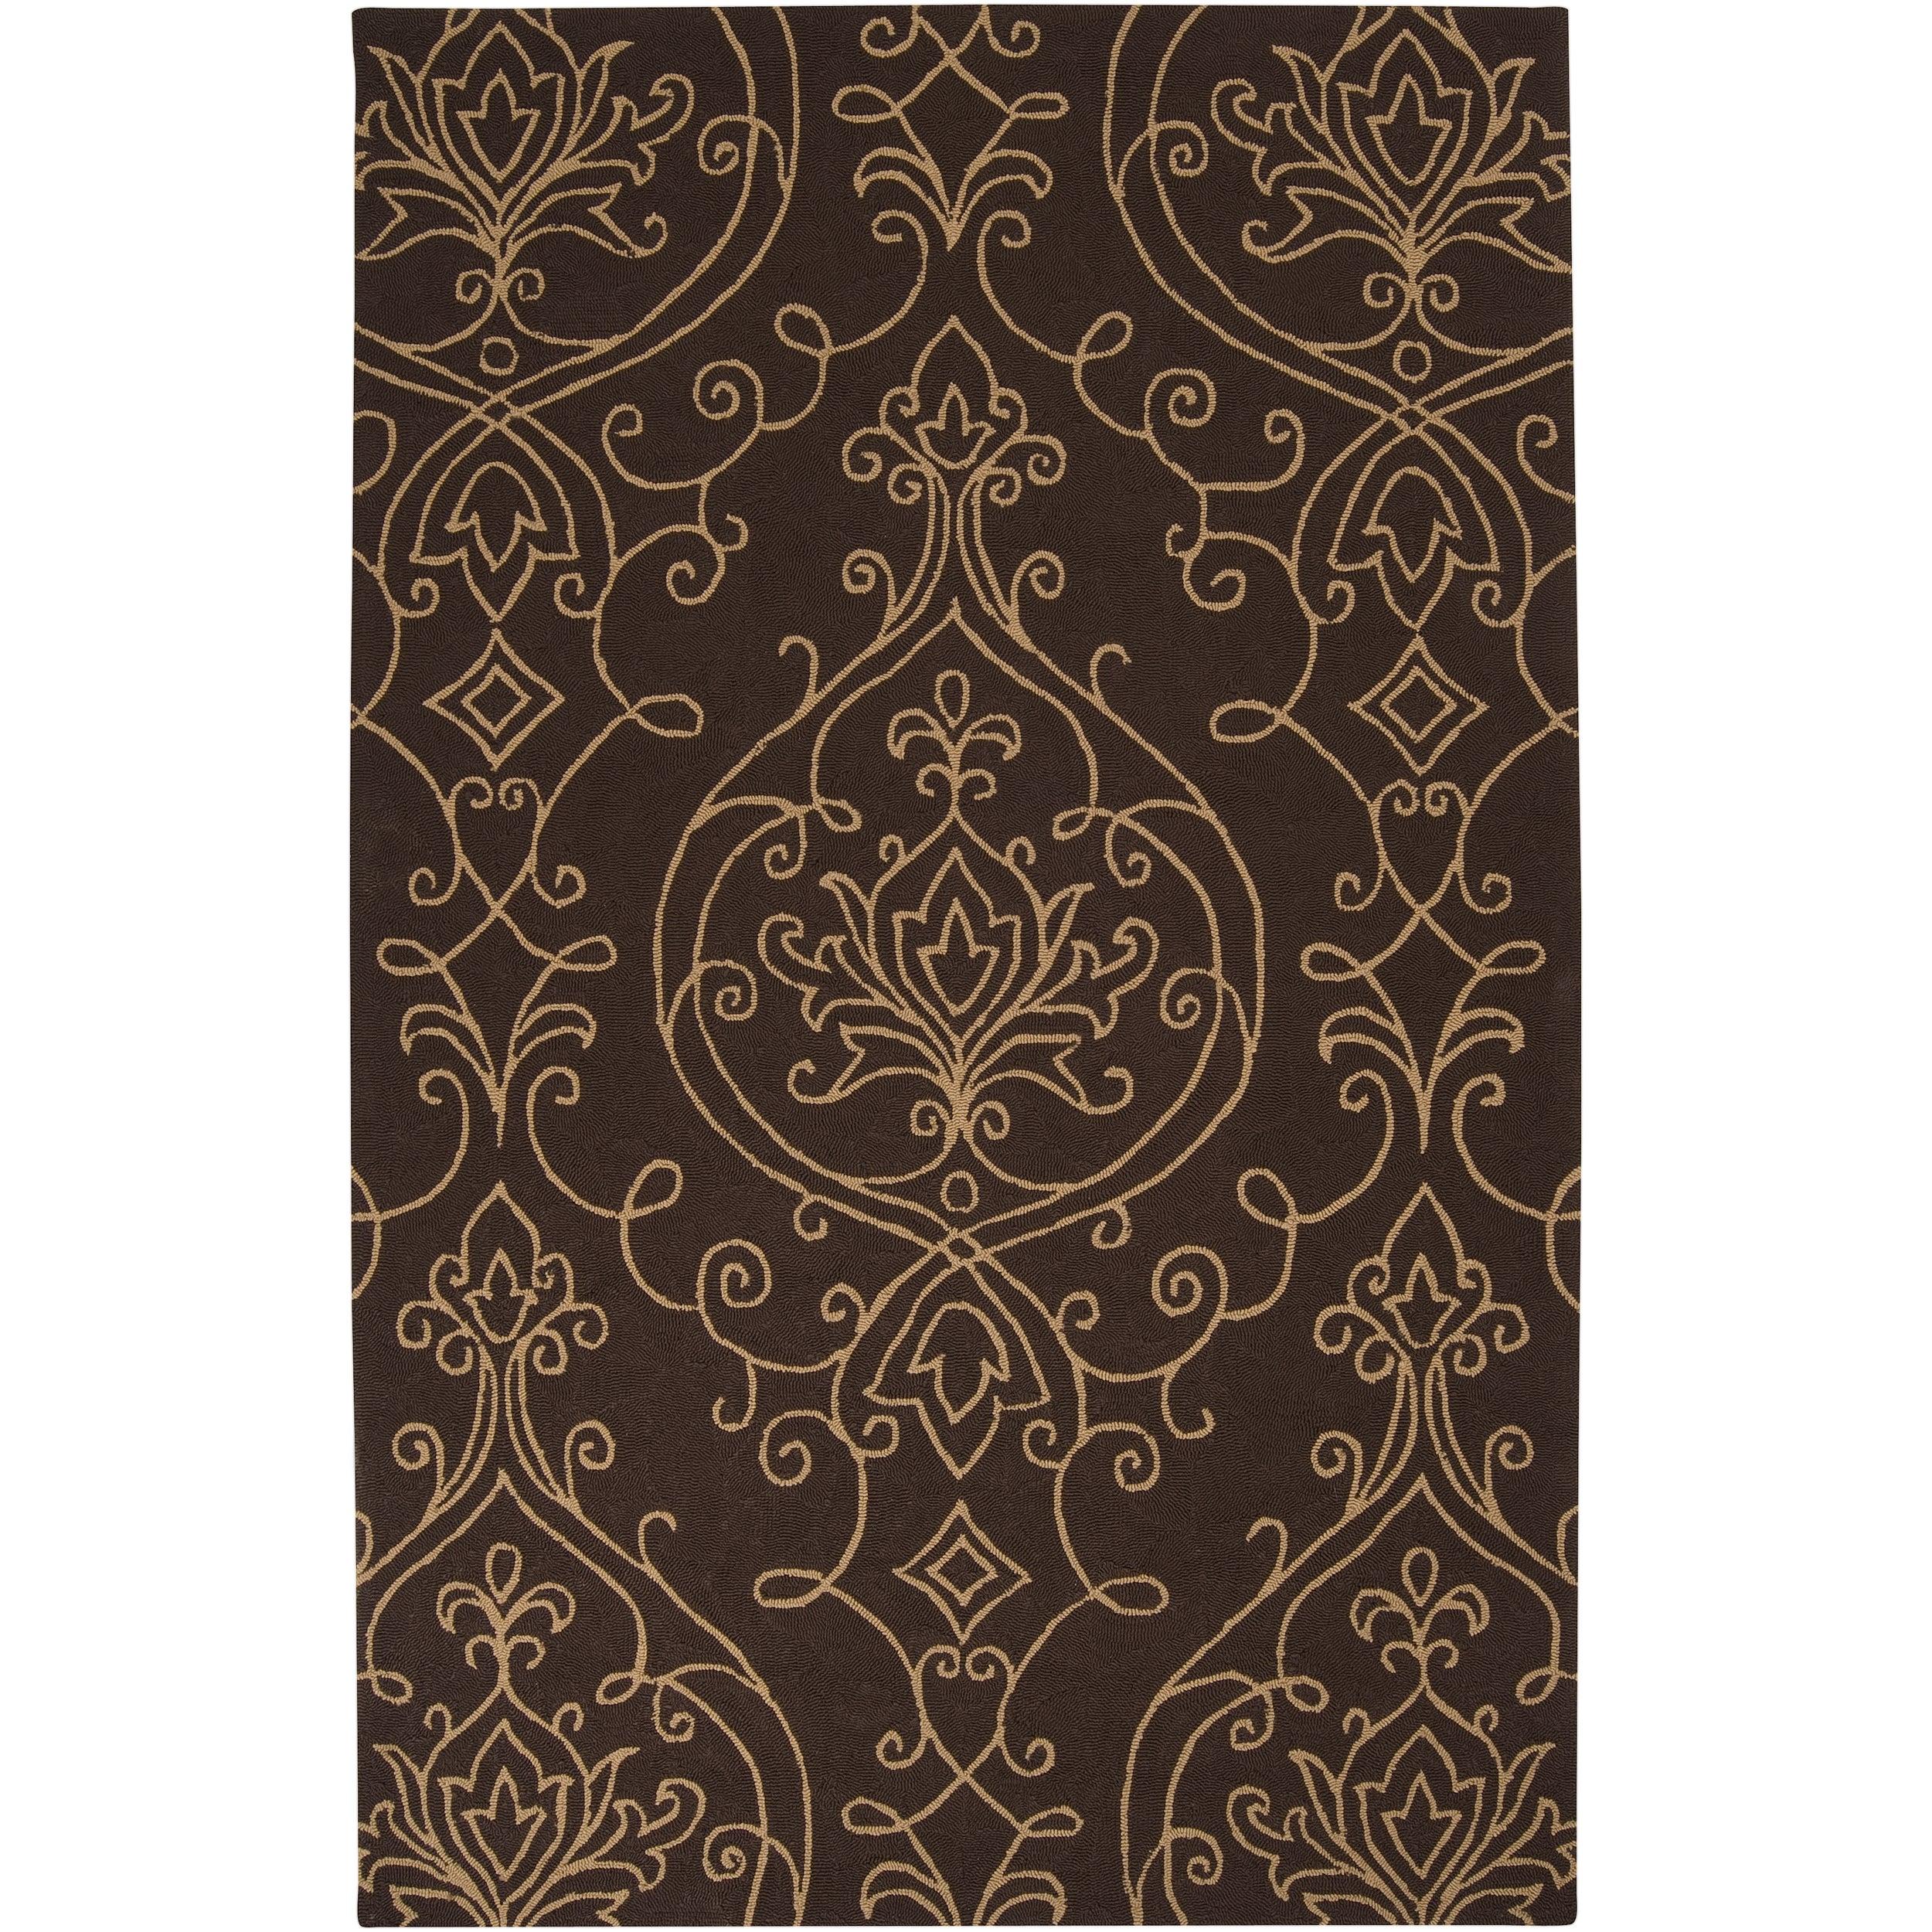 Hand-hooked Haxby Indoor/Outdoor Damask Print Rug (9' x 12')